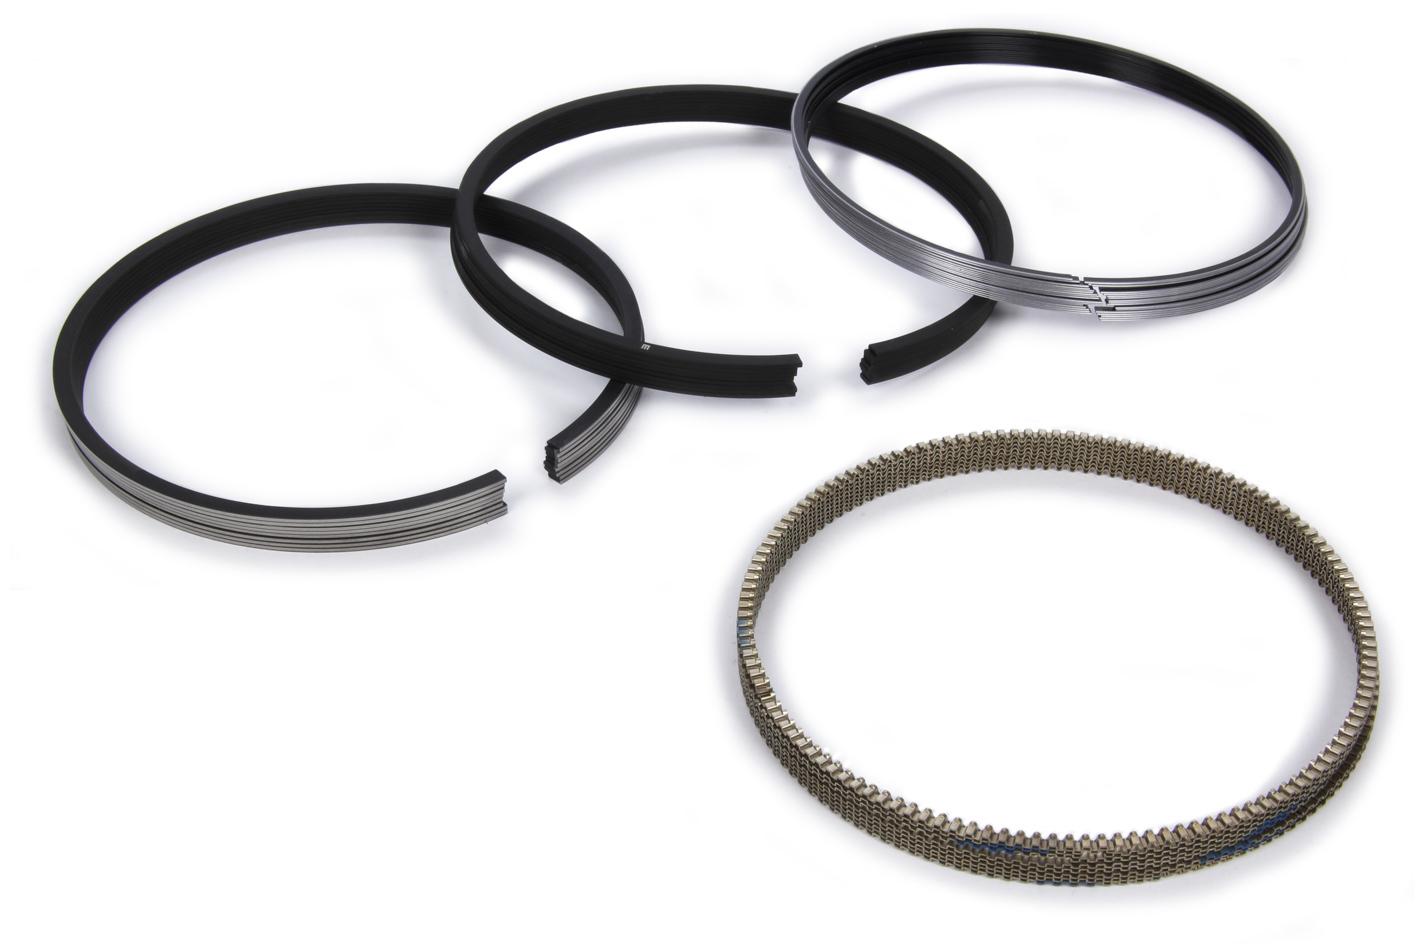 Piston Ring Set 4.170 1.0mm 1.0mm 2.0mm